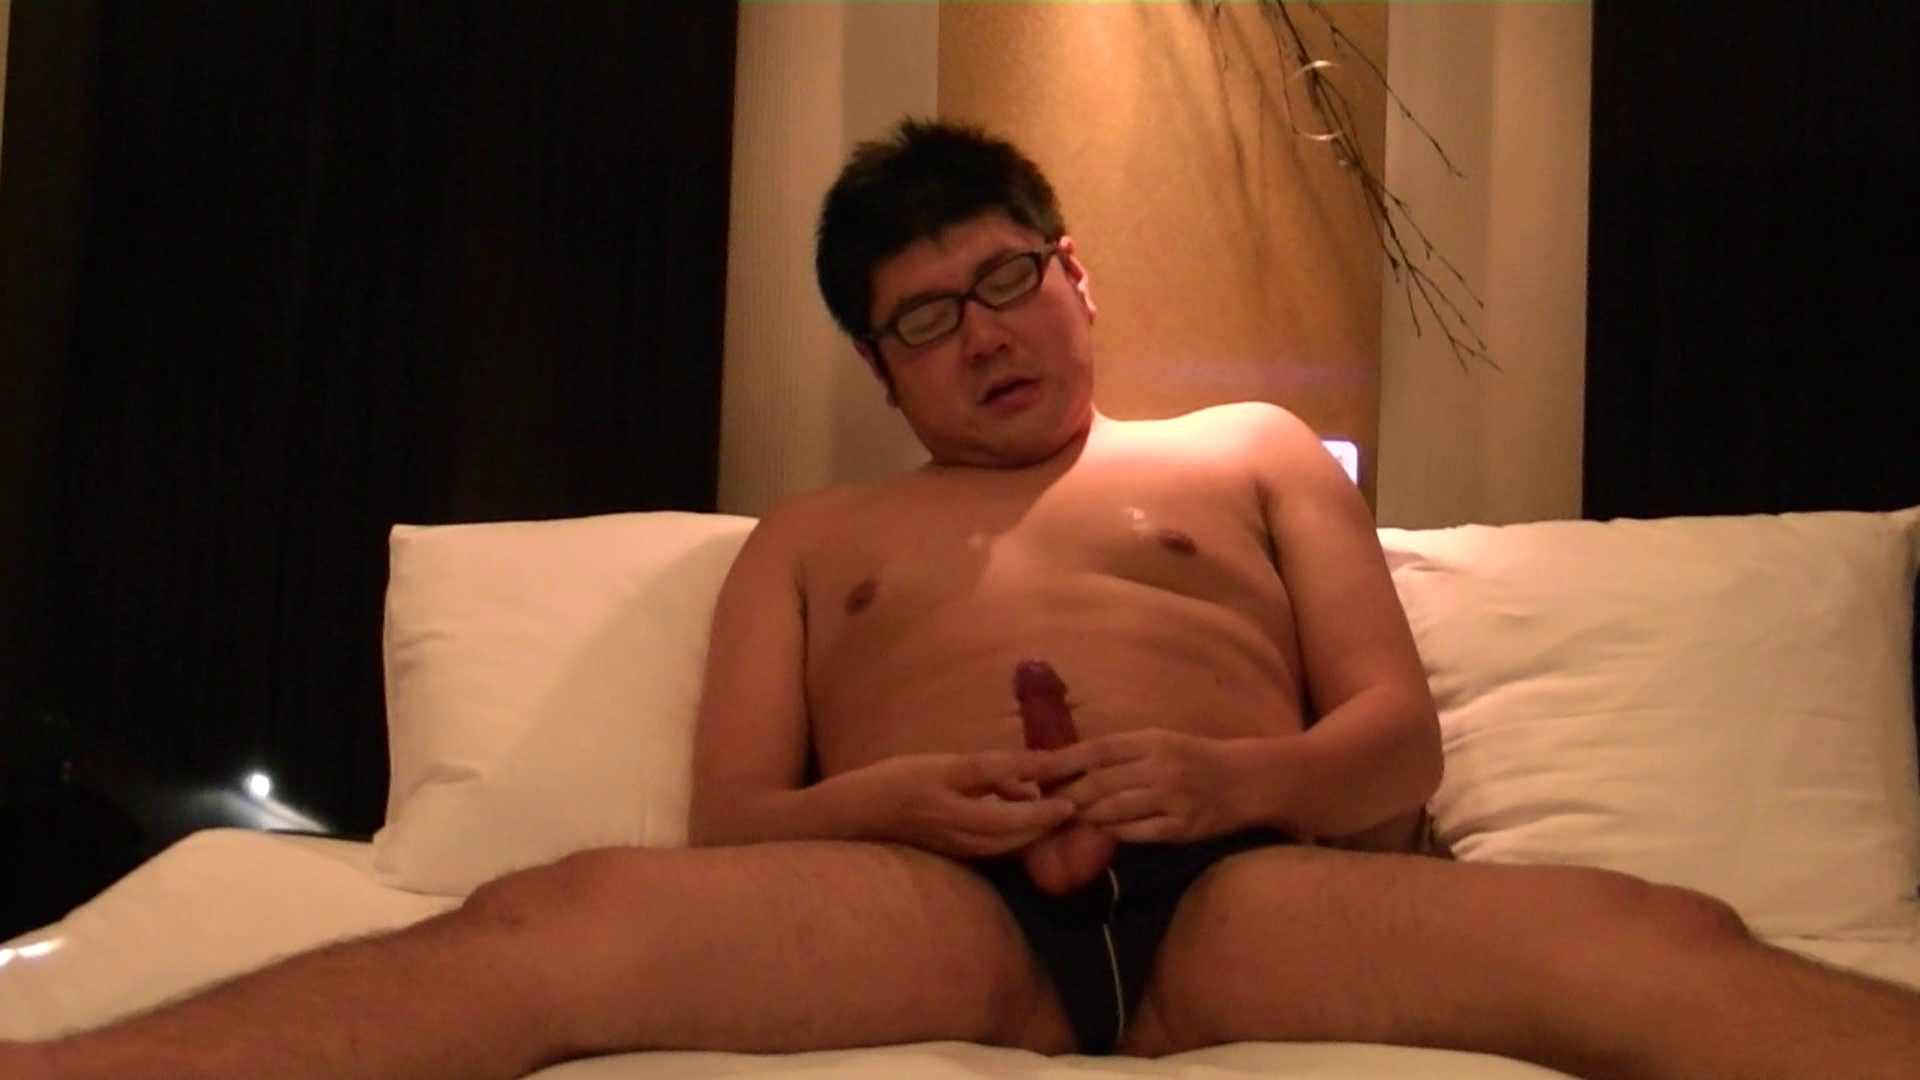 Mr.オナックスさん投稿!HD 貴方のオナニー三万円で撮影させてください。VOL.02 前編 ノンケのオナニー ペニス画像 105連発 66